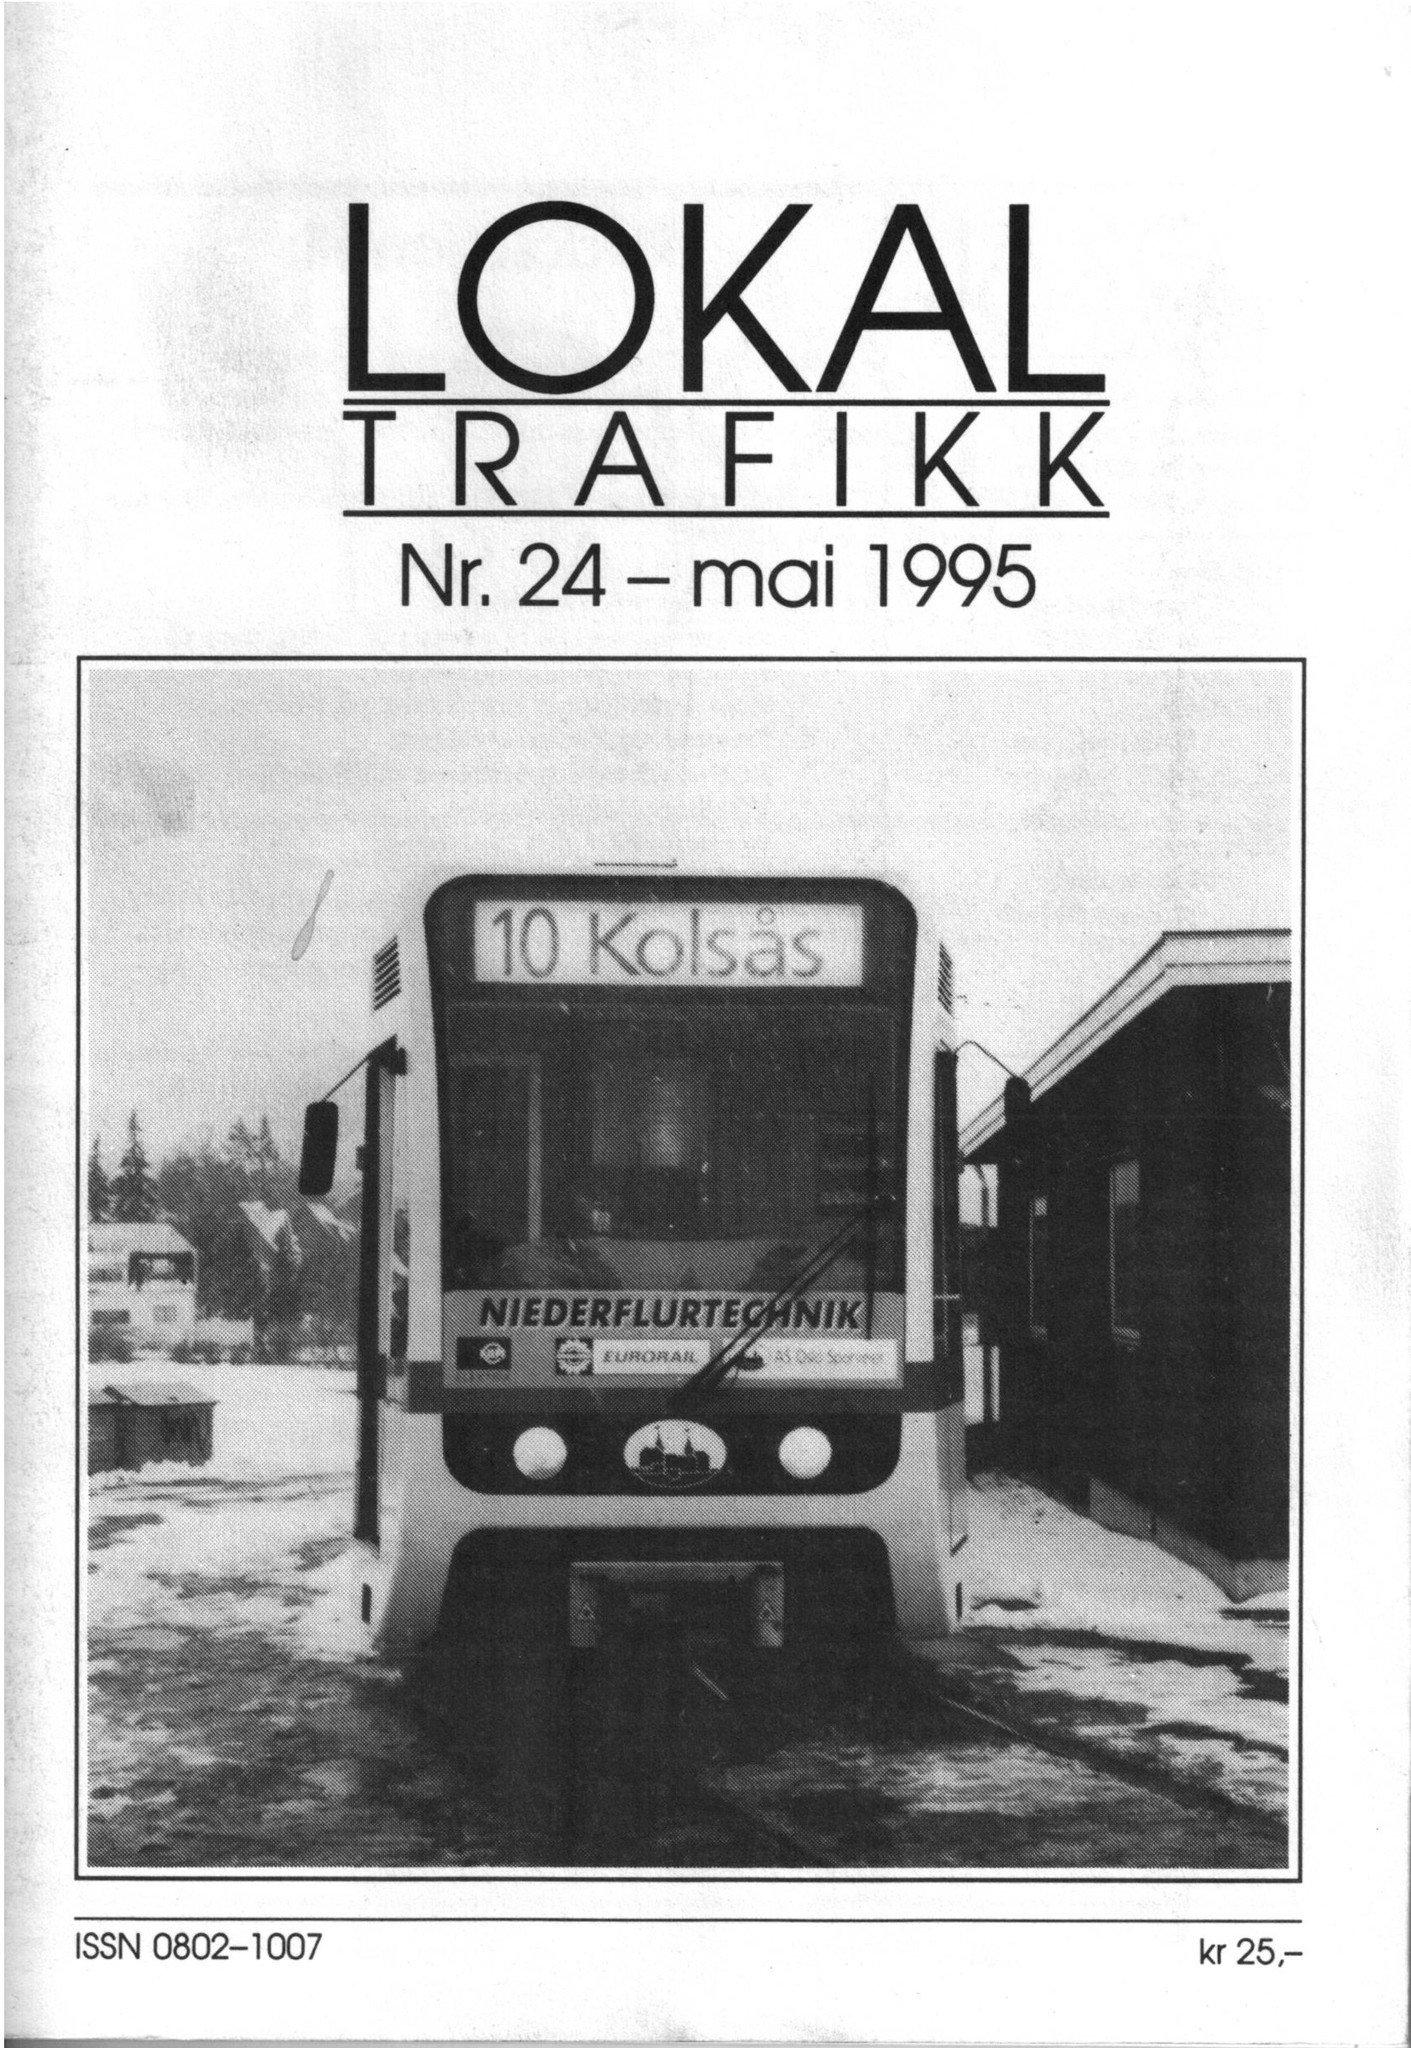 Lokaltrafikk #024